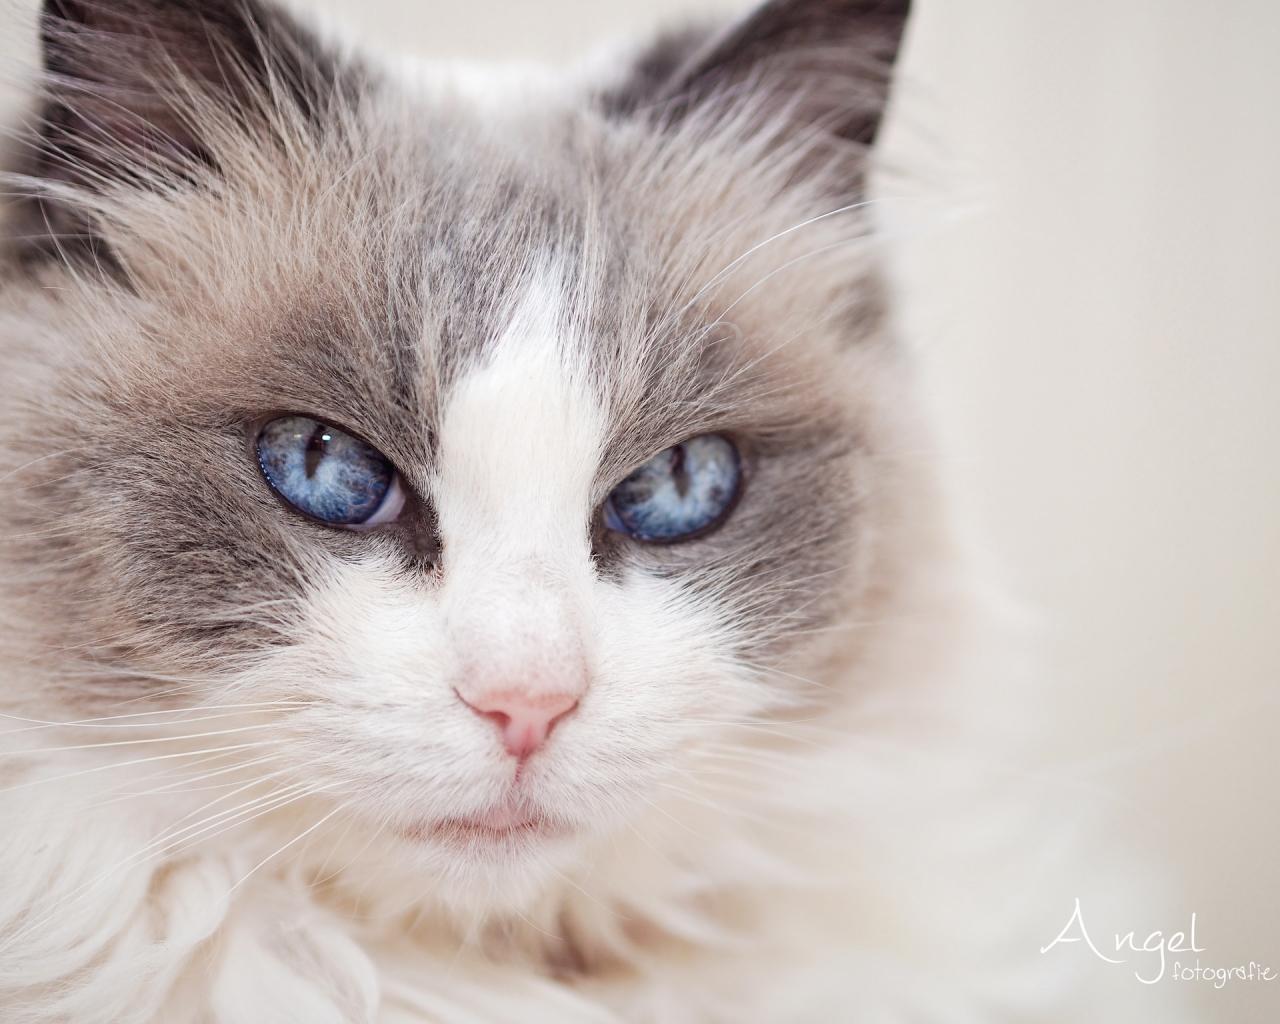 Gatos hermosos - 1280x1024